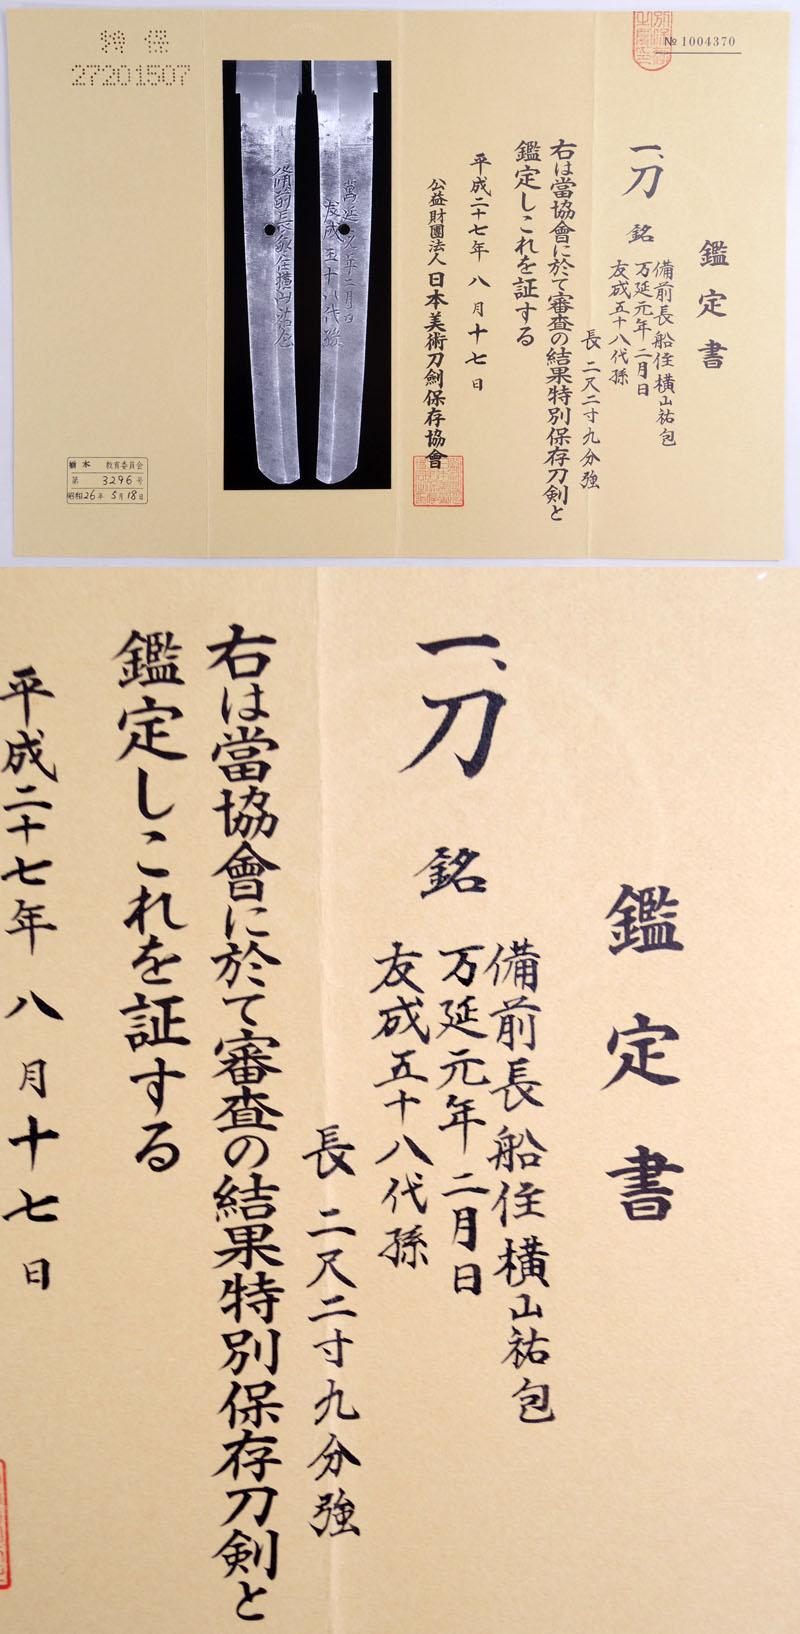 備前長船住横山祐包 Picture of Certificate